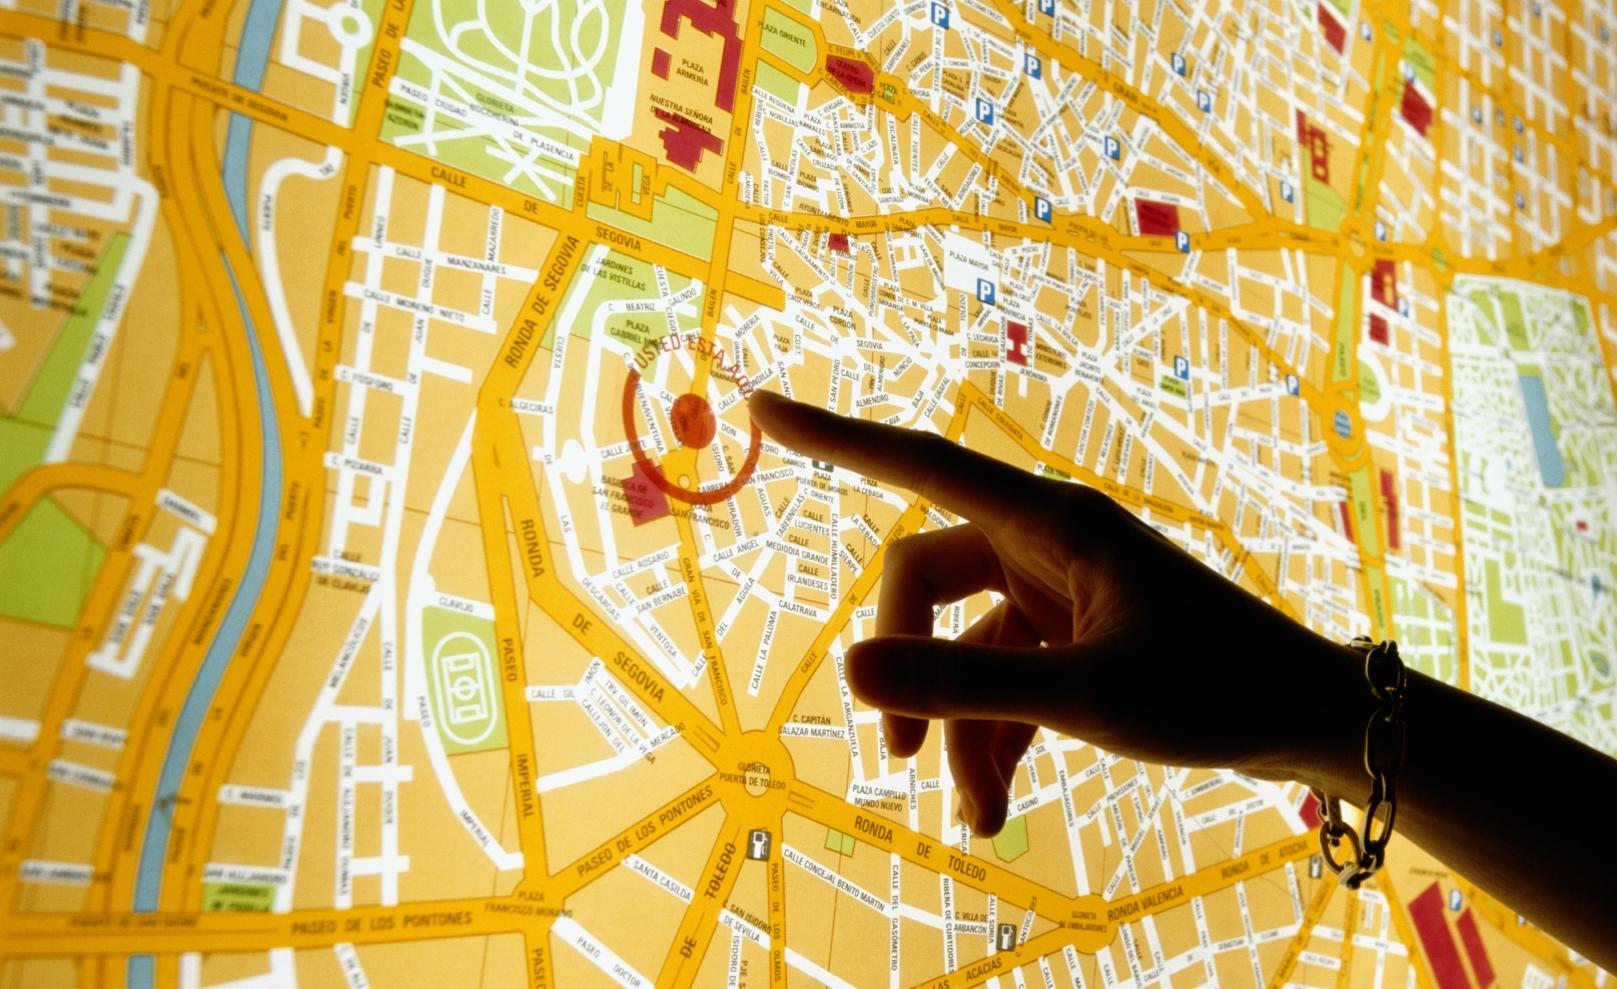 Spy World Miami Services - Chicago map gps